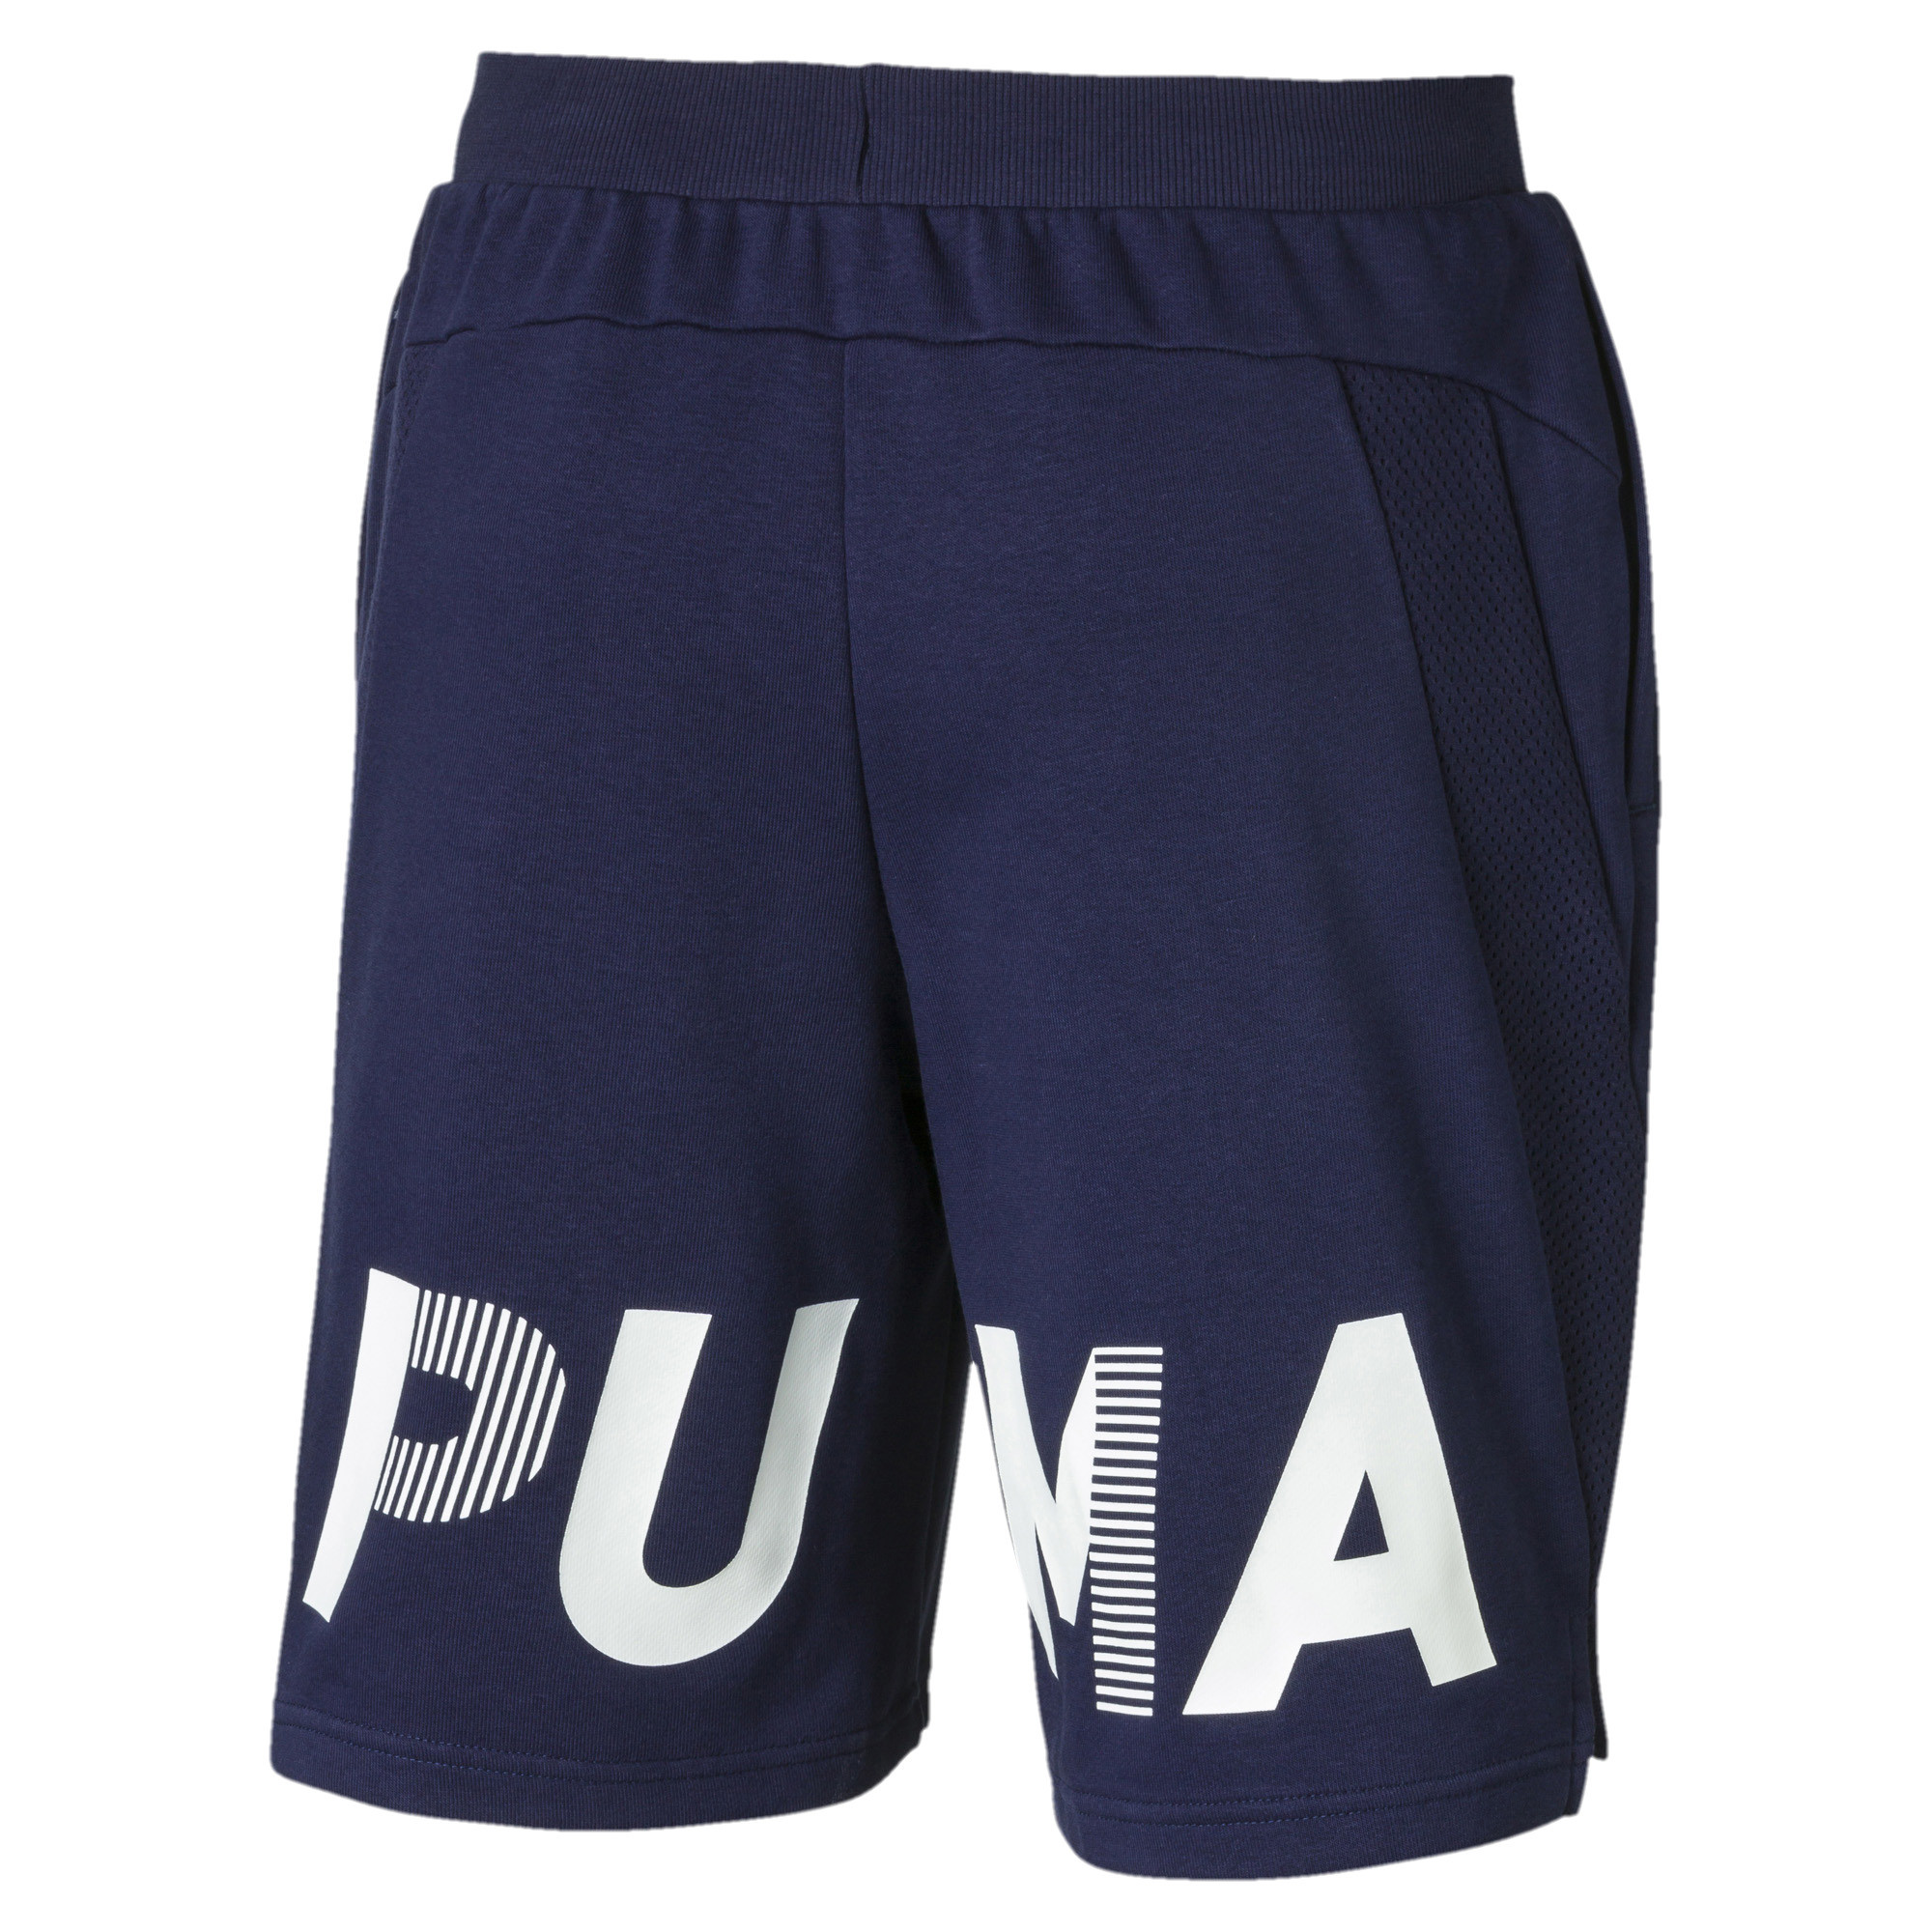 PUMA-Modern-Sports-Men-039-s-Shorts-Men-Knitted-Shorts-Basics thumbnail 13